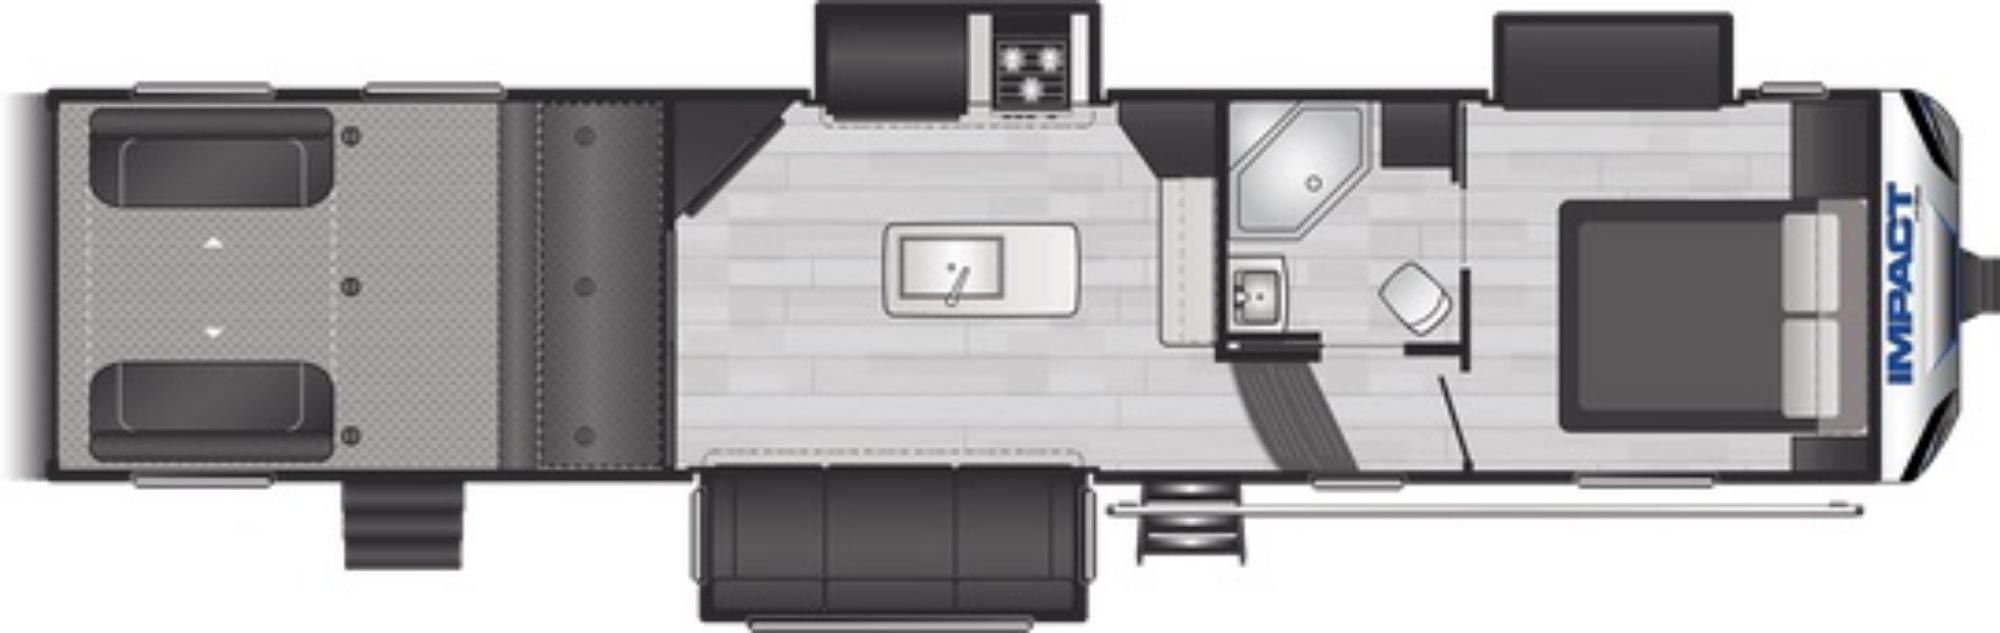 View Floor Plan for 2021 KEYSTONE IMPACT 343